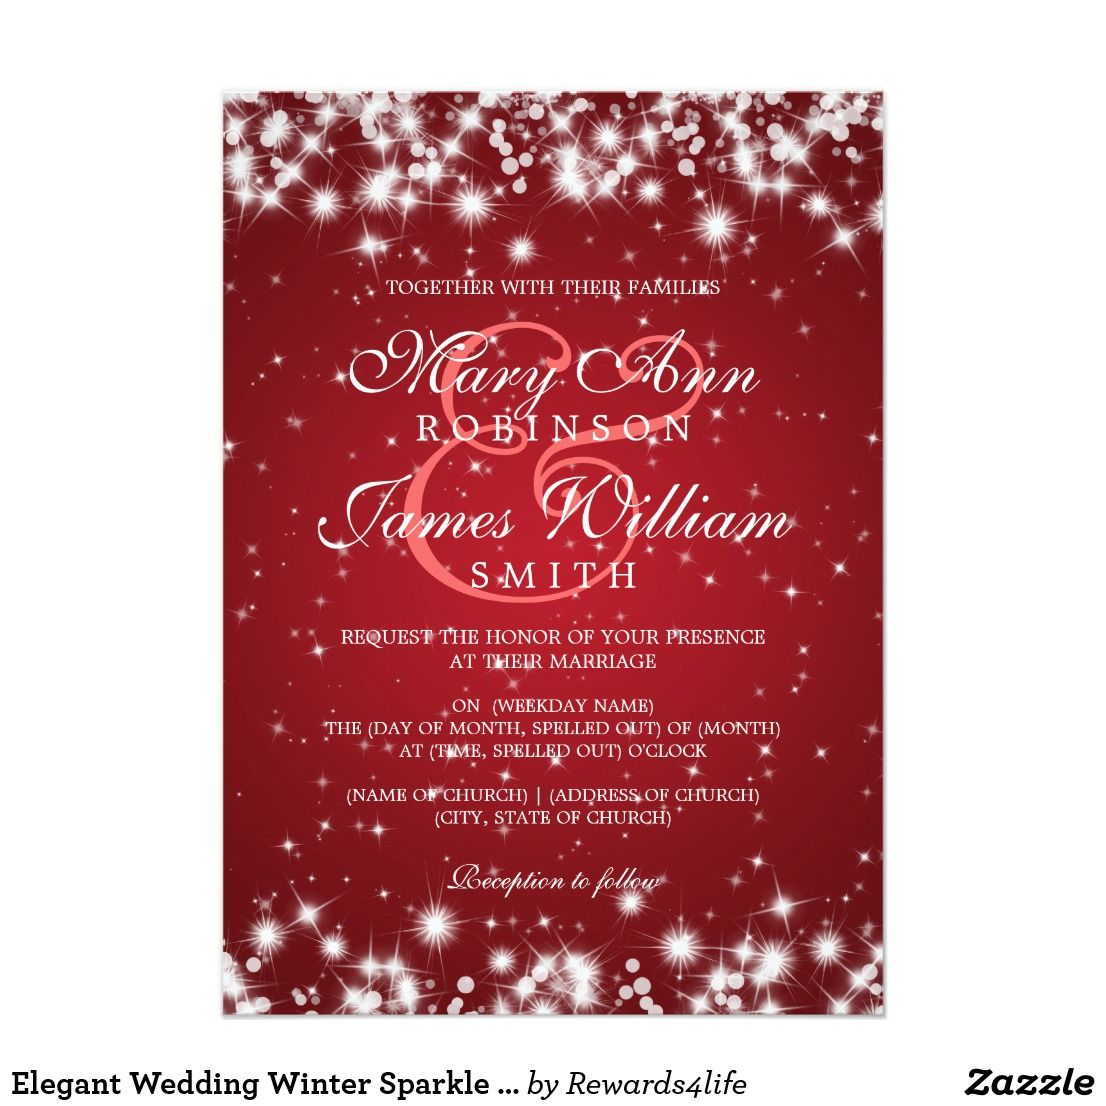 Elegant Wedding Winter Sparkle Red Card | Wedding Ideas | Pinterest ...